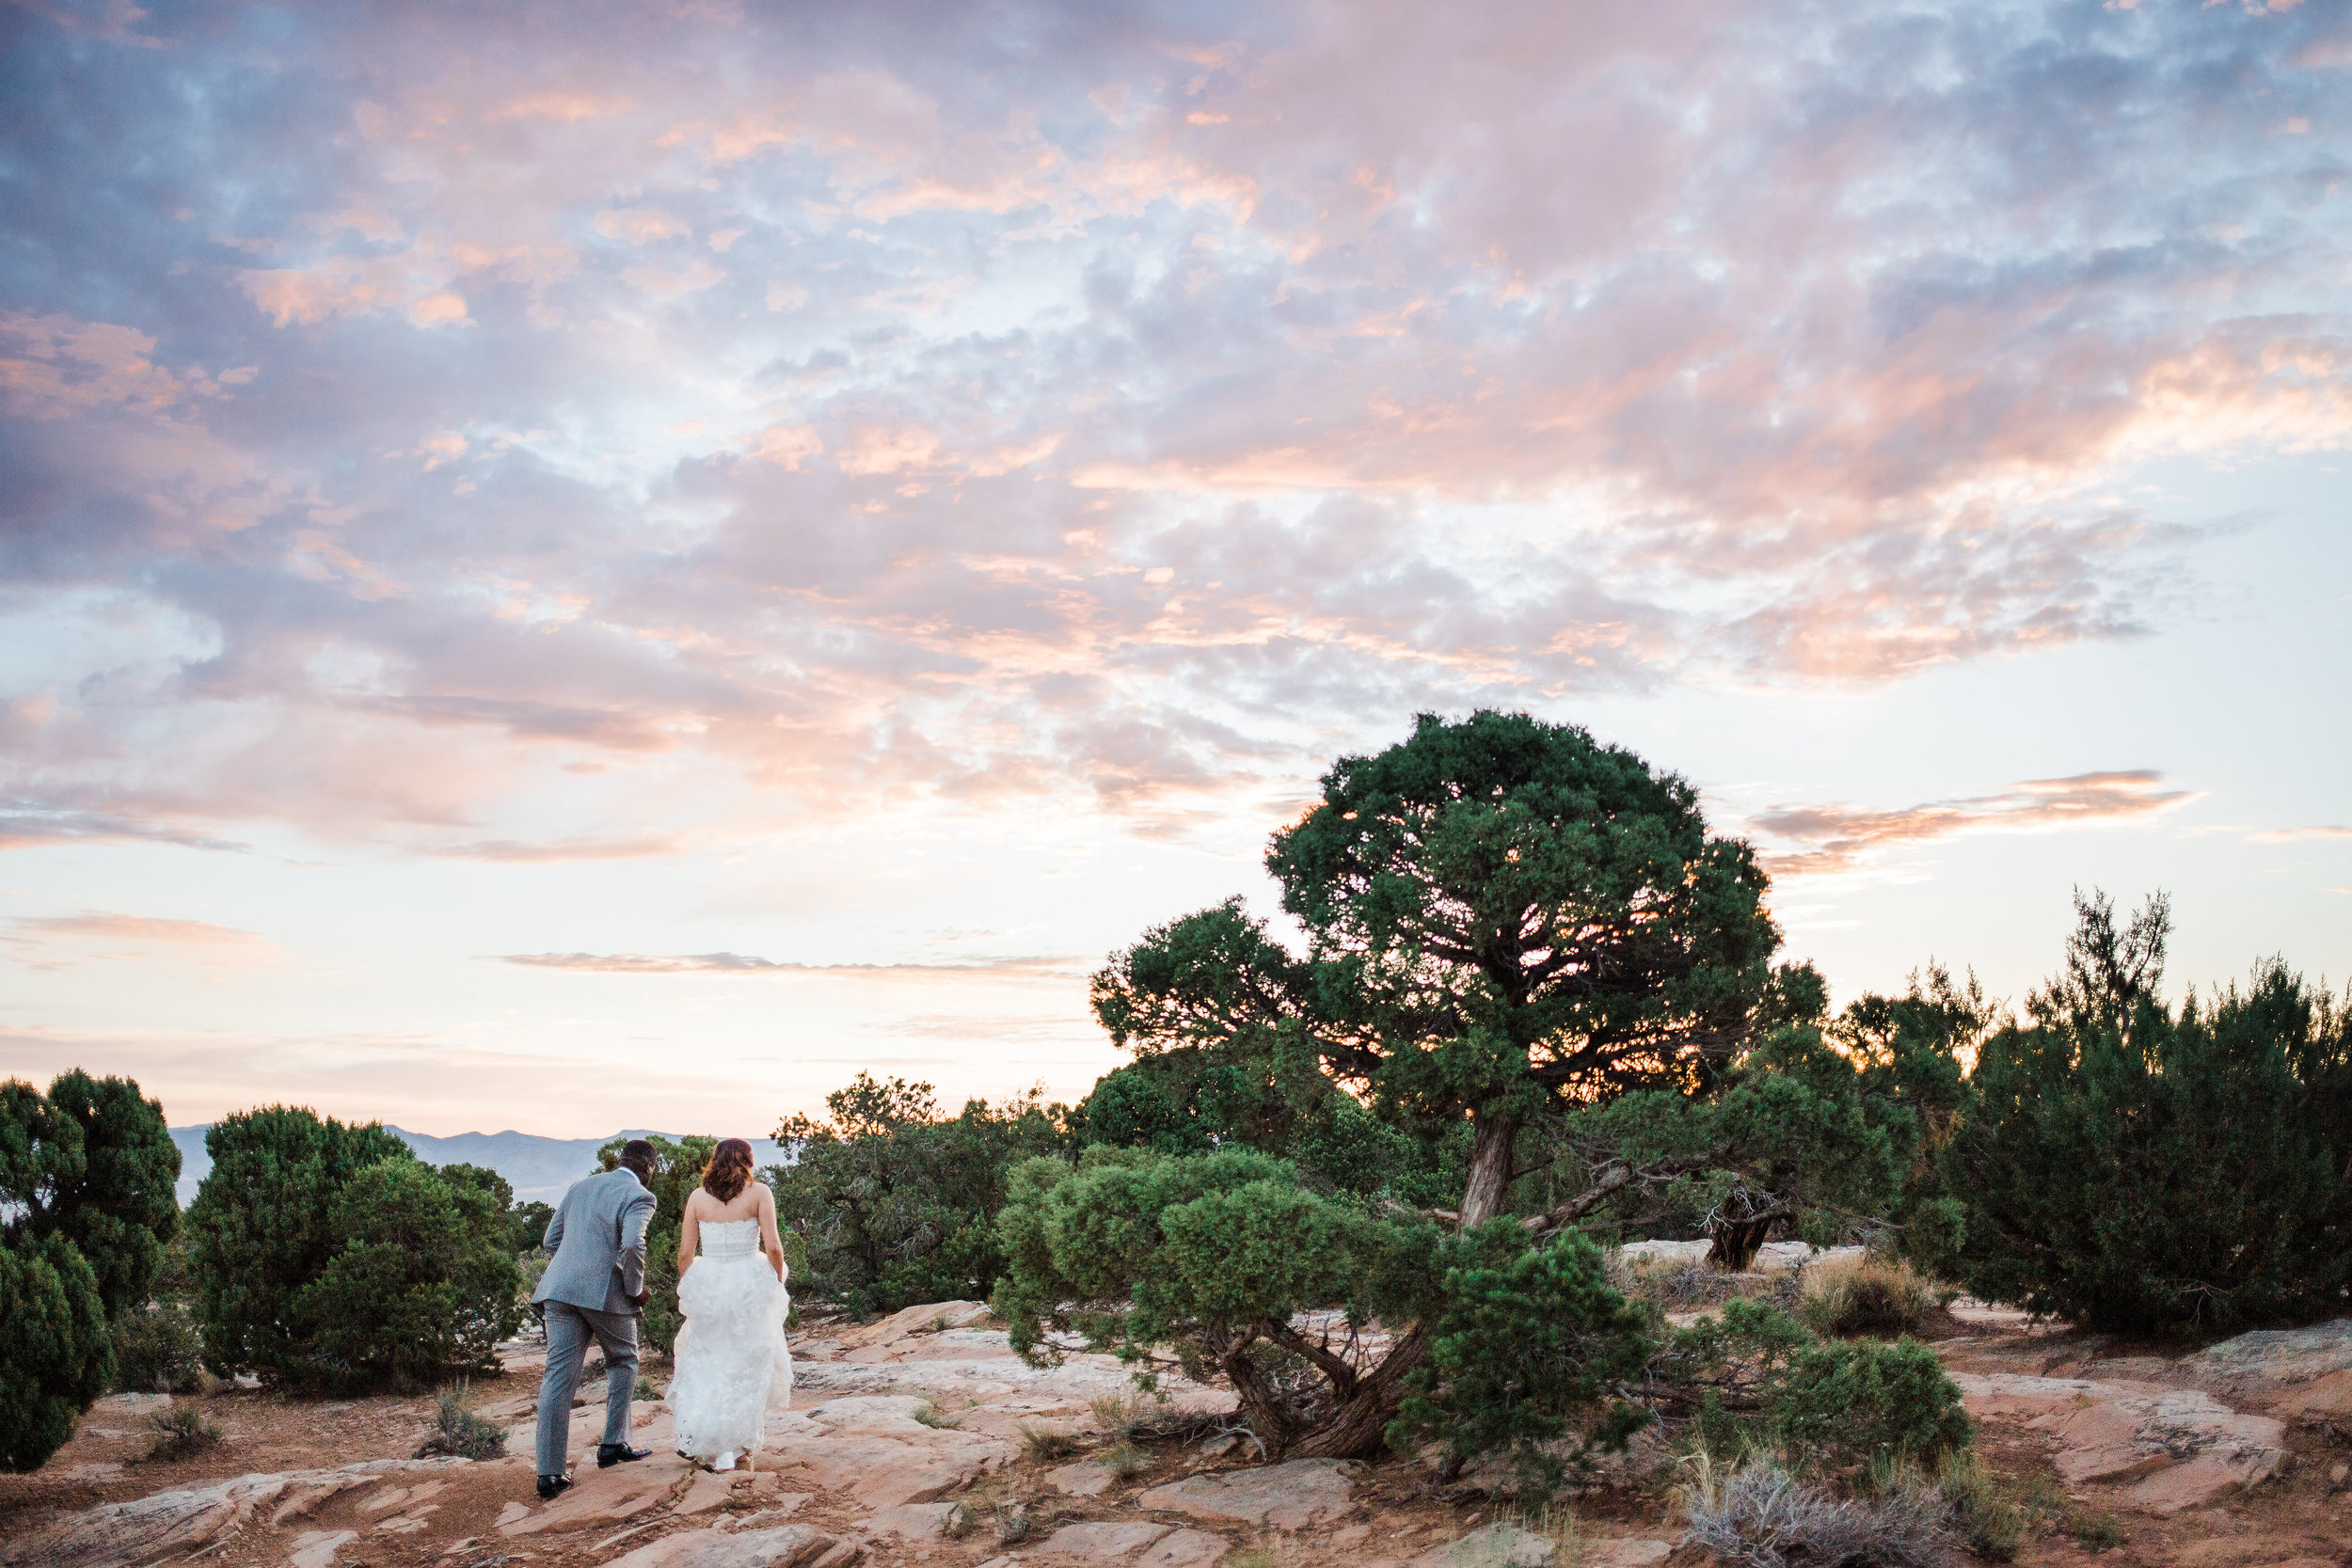 Sunrise in Colorado National Monument adventure wedding photography